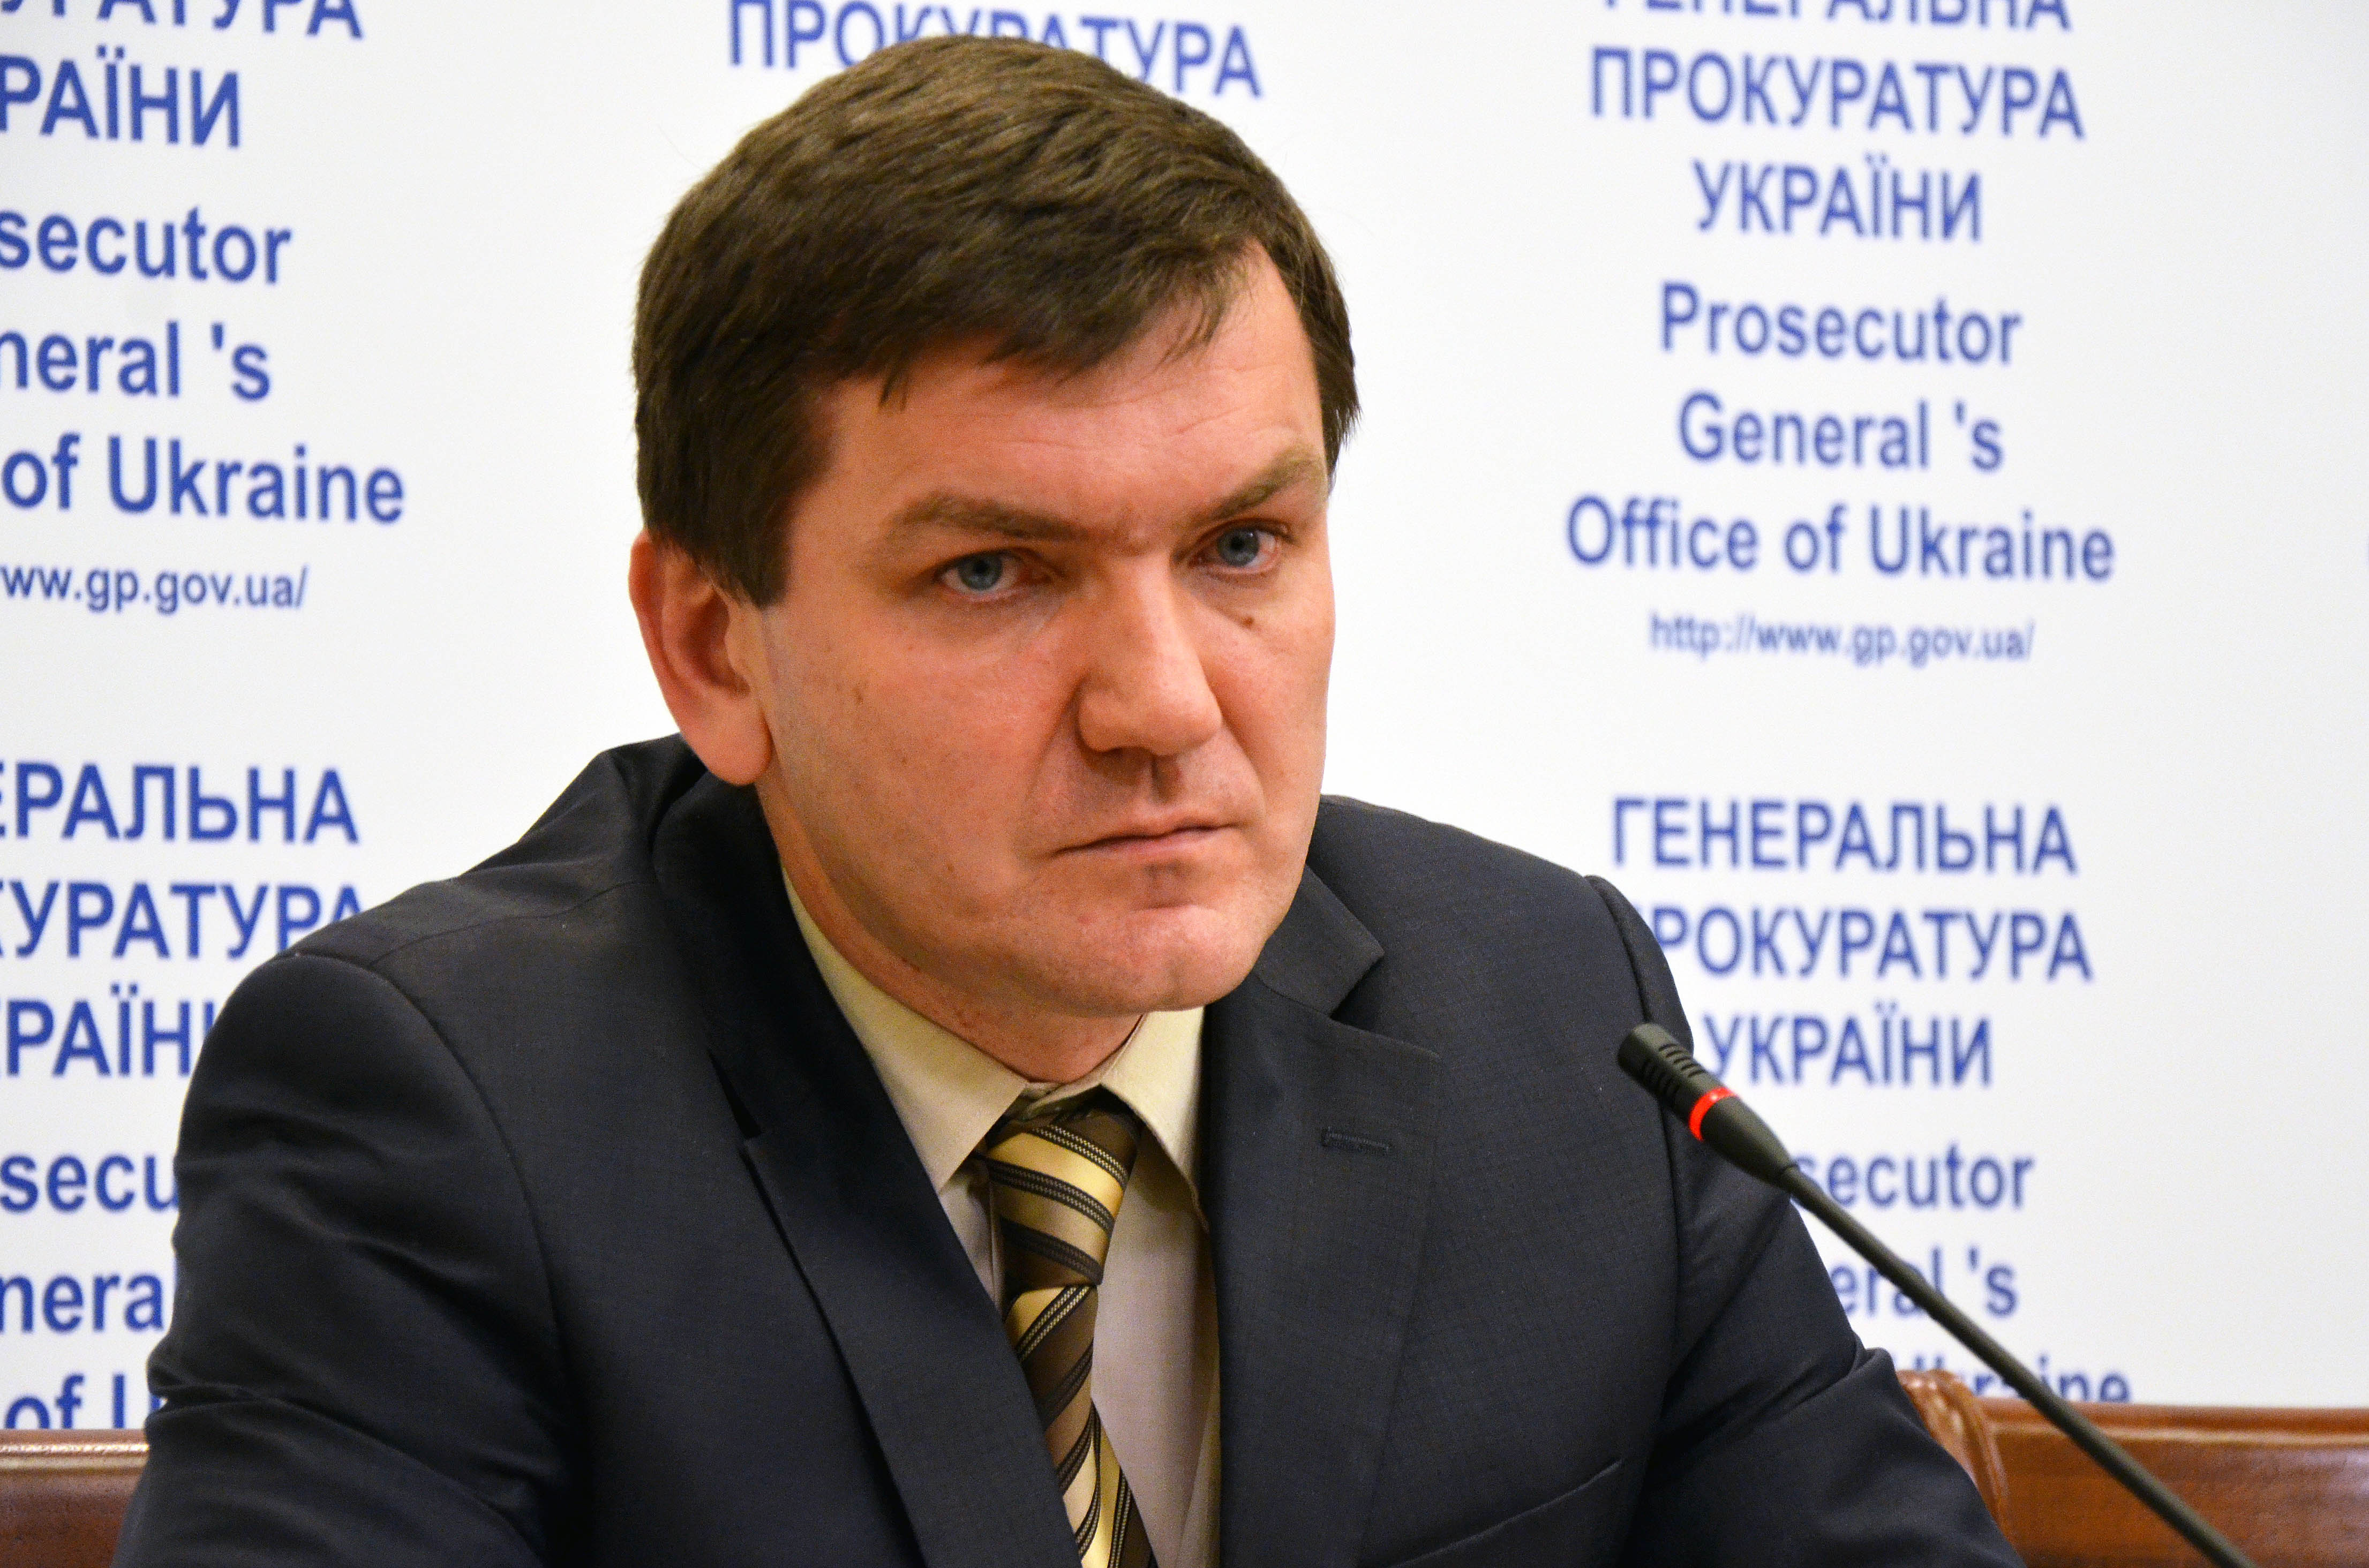 Д.Вороненкова допрашивали и о злодеяниях впроцессе Евромайдана— ГПУ